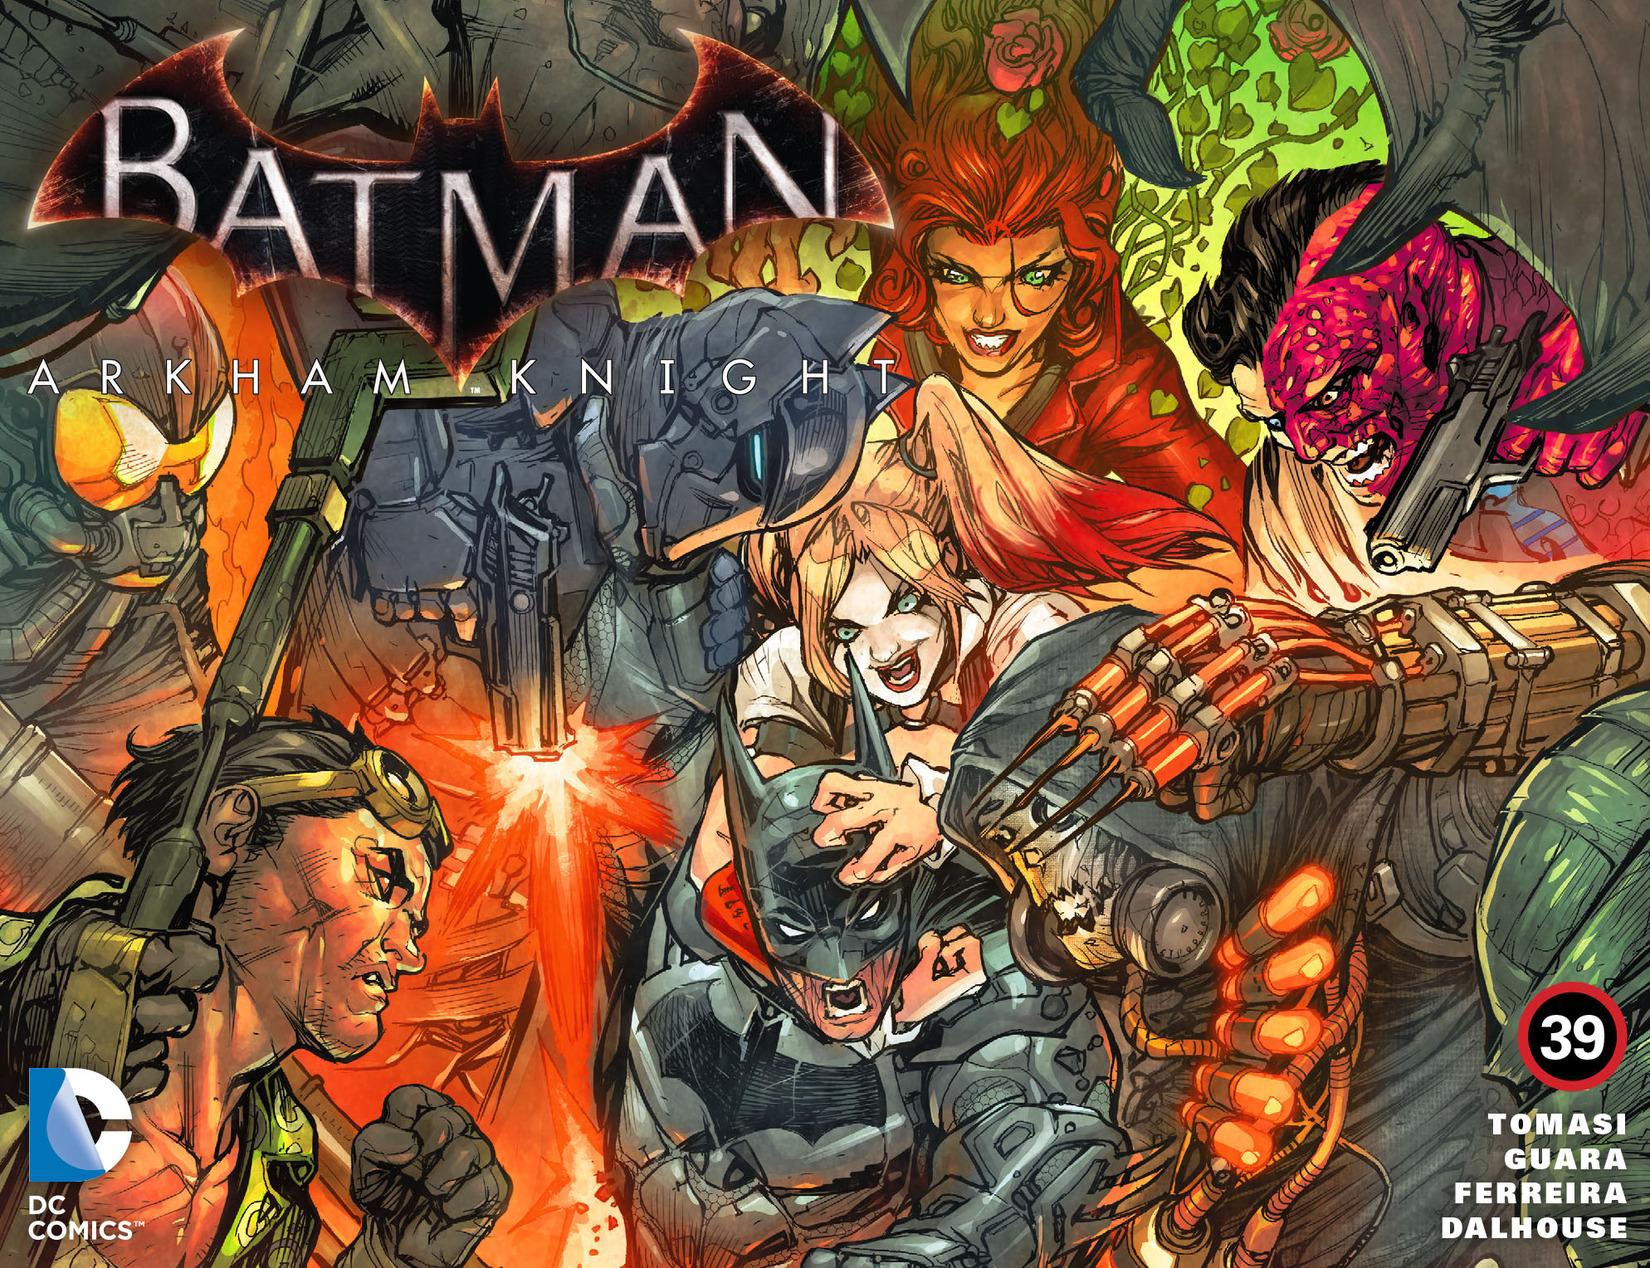 Batman: Arkham Knight [I] 39 Page 1